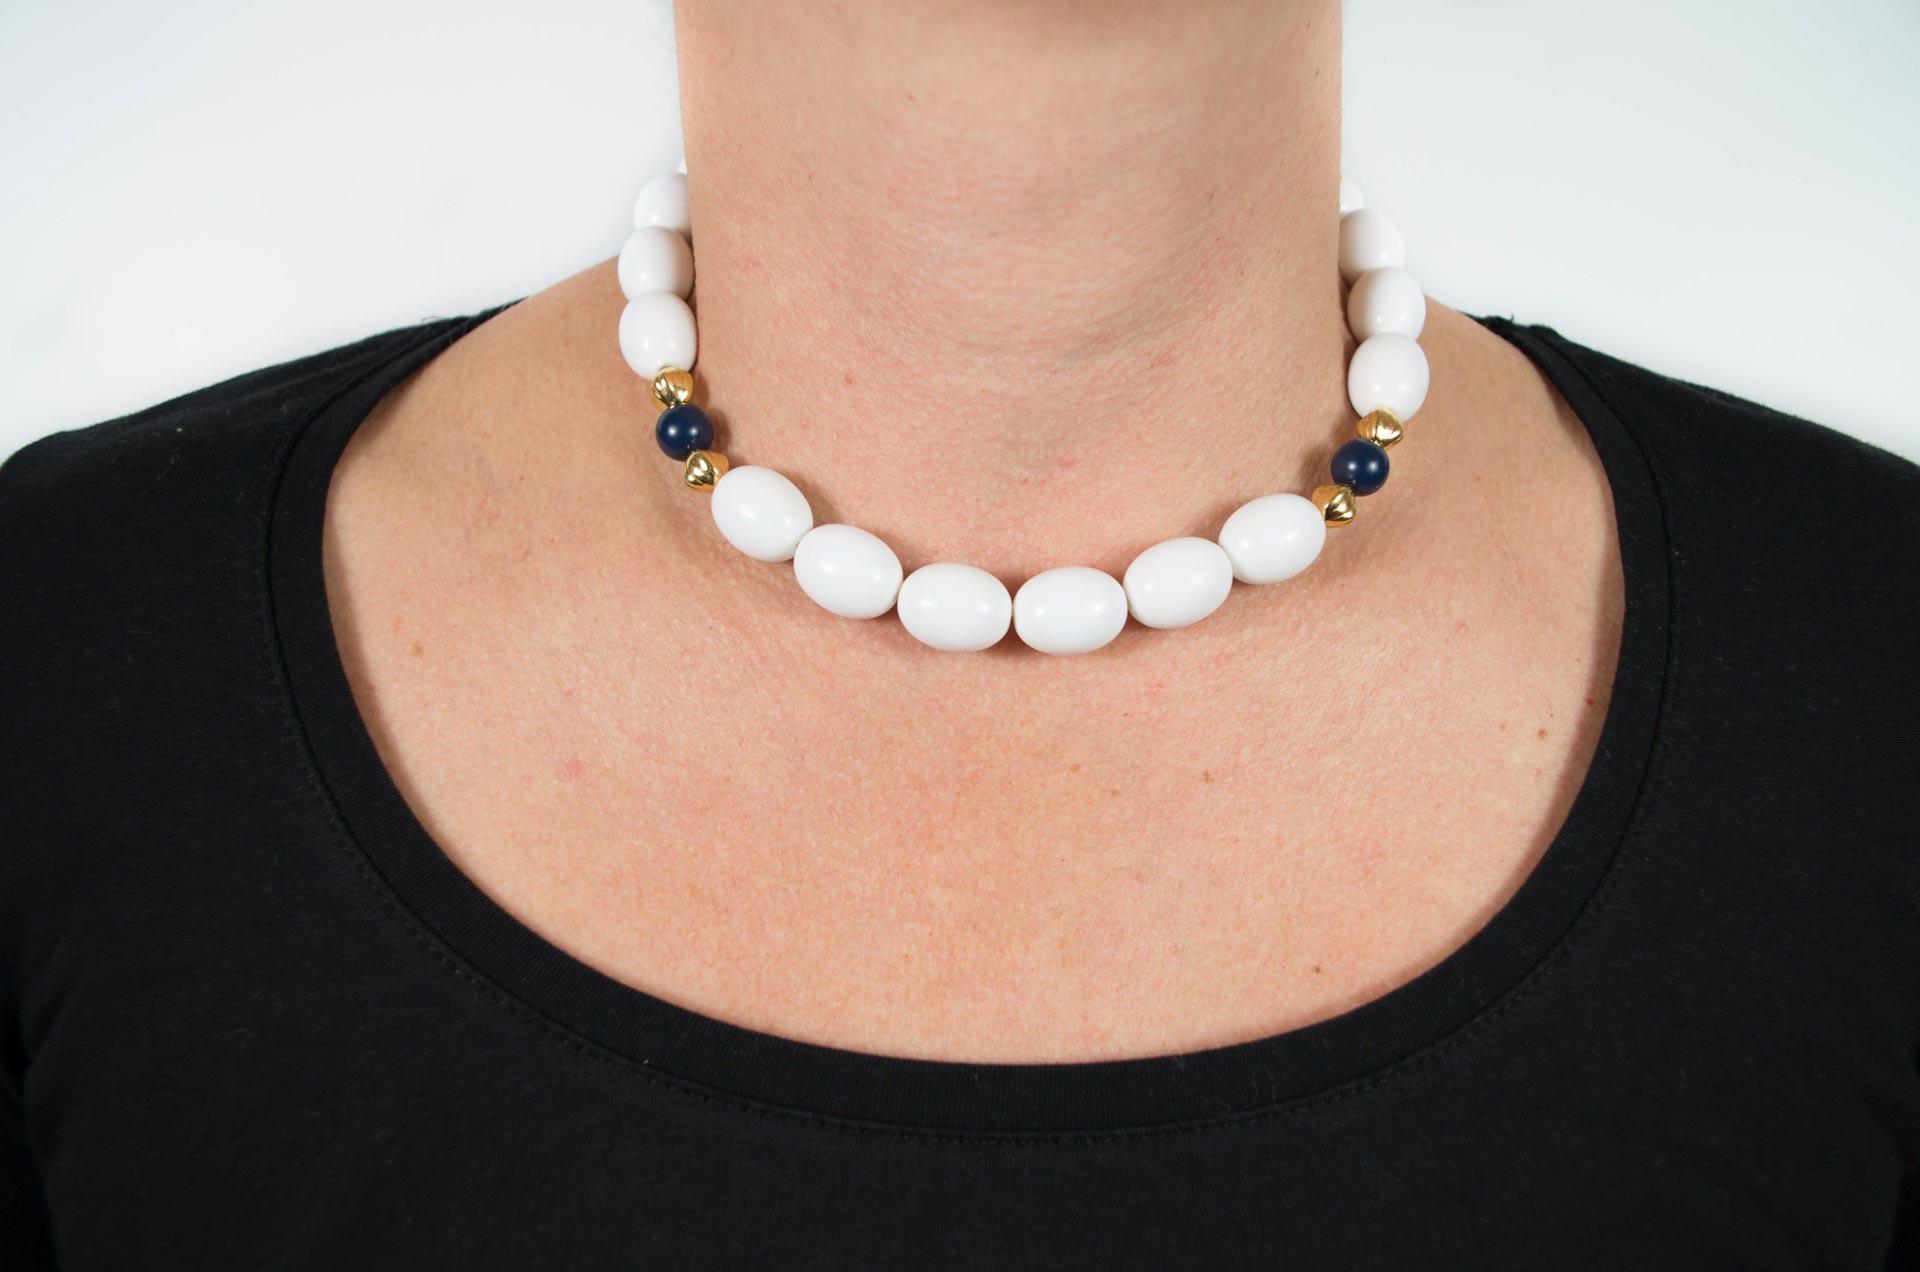 girocollo firmato monet perle bianche 5